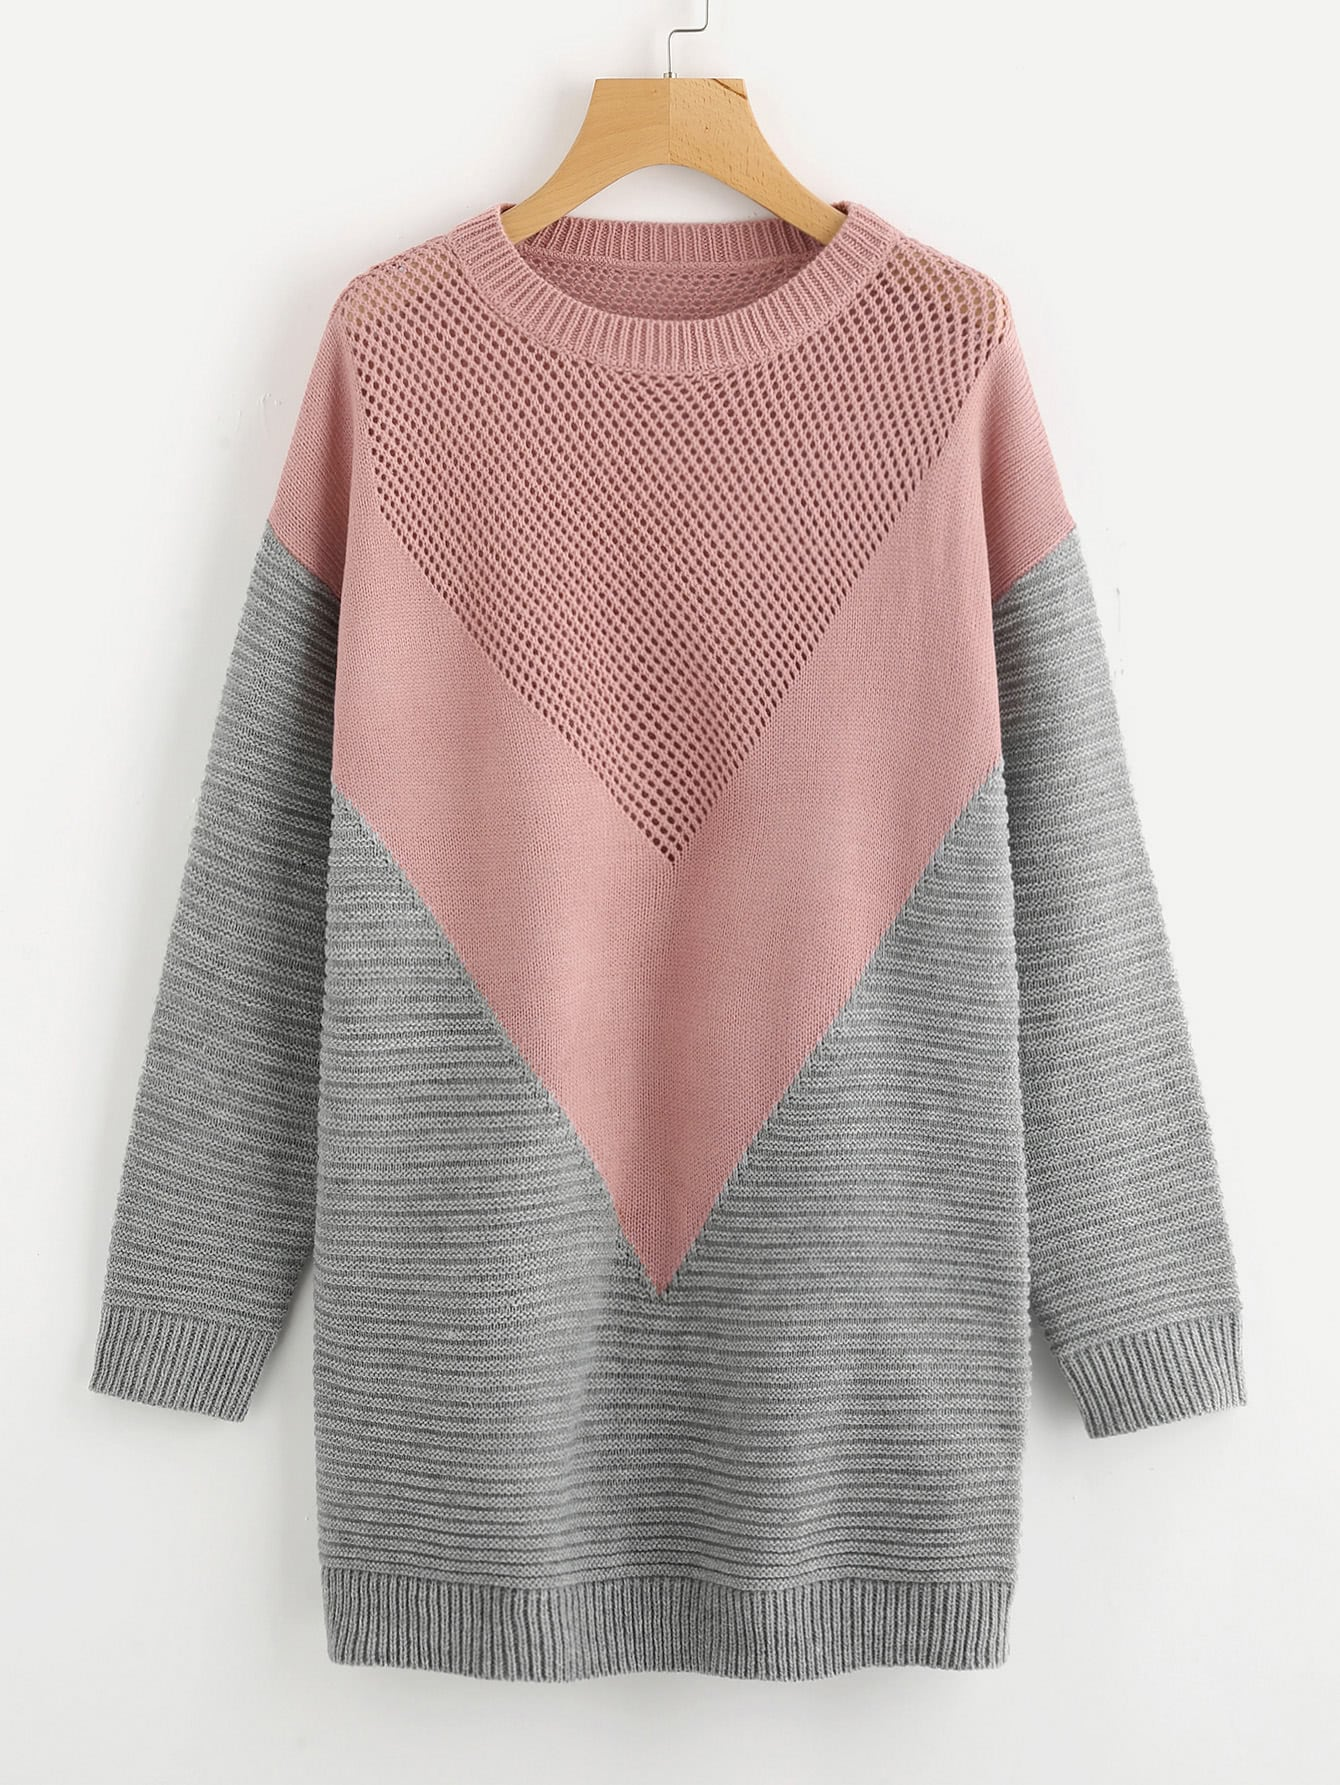 Eyelet Panel Color Block Chevron Jumper sweater170904462